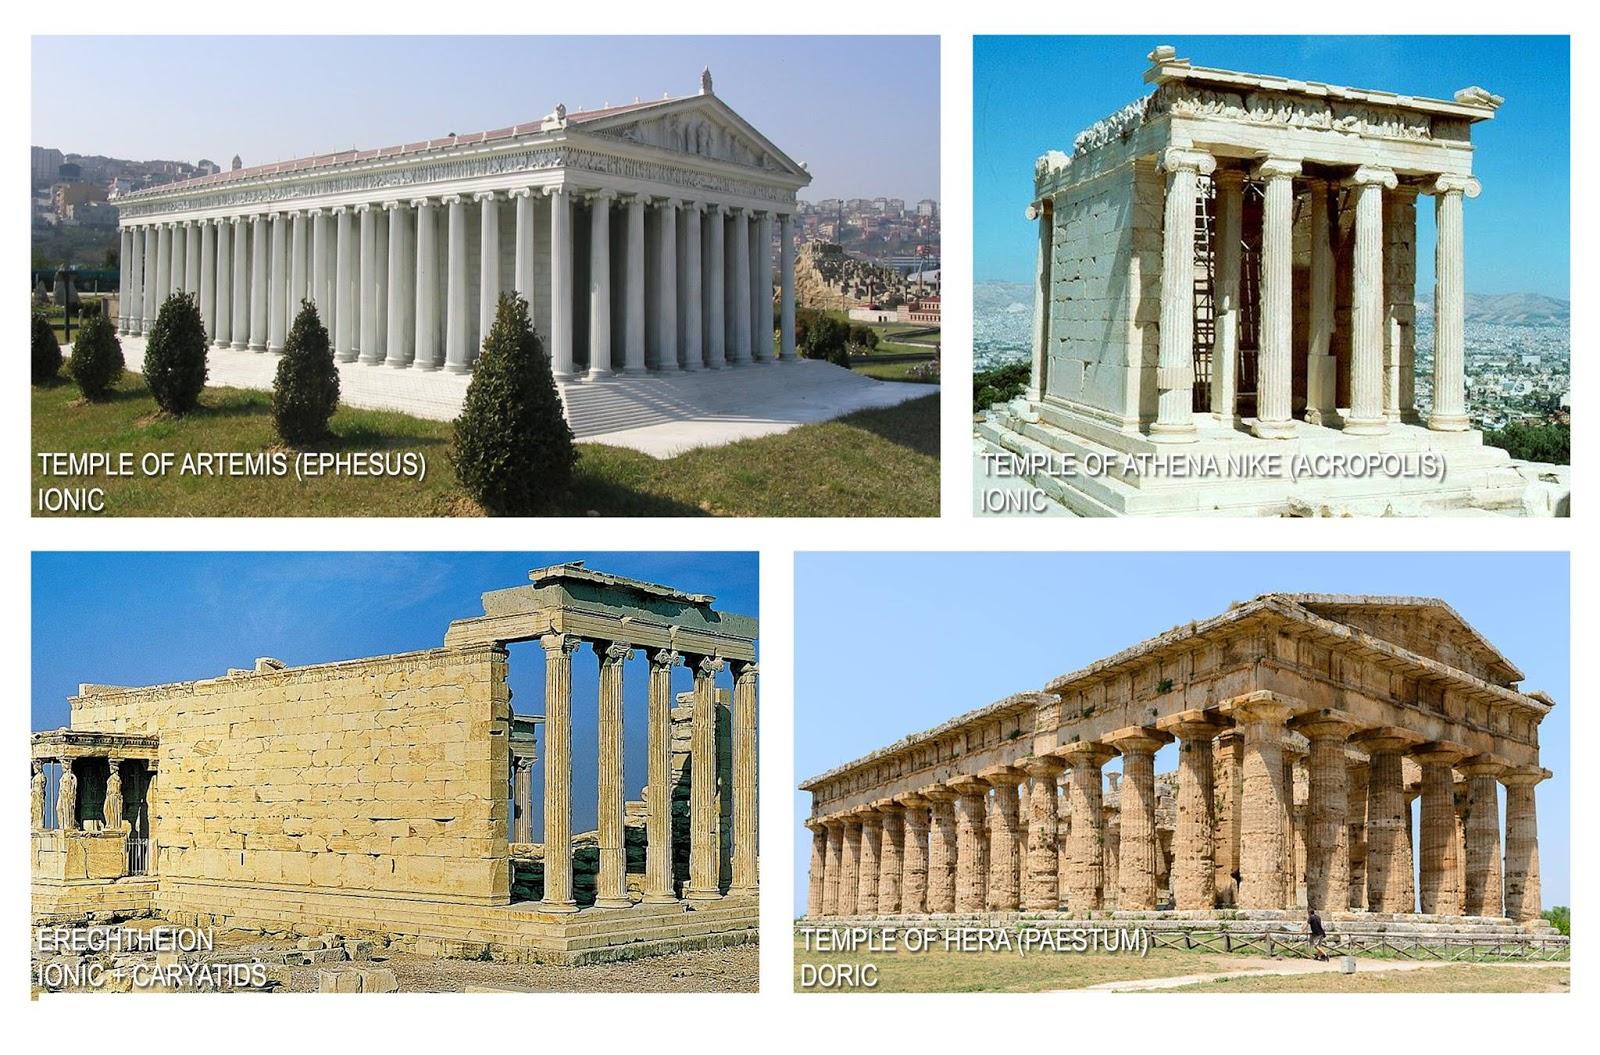 visit ancient greece com temple of athena nike brothersoft com erechtheion norbert nagel via wikipedia temple of hera paestum  [ 1600 x 1055 Pixel ]